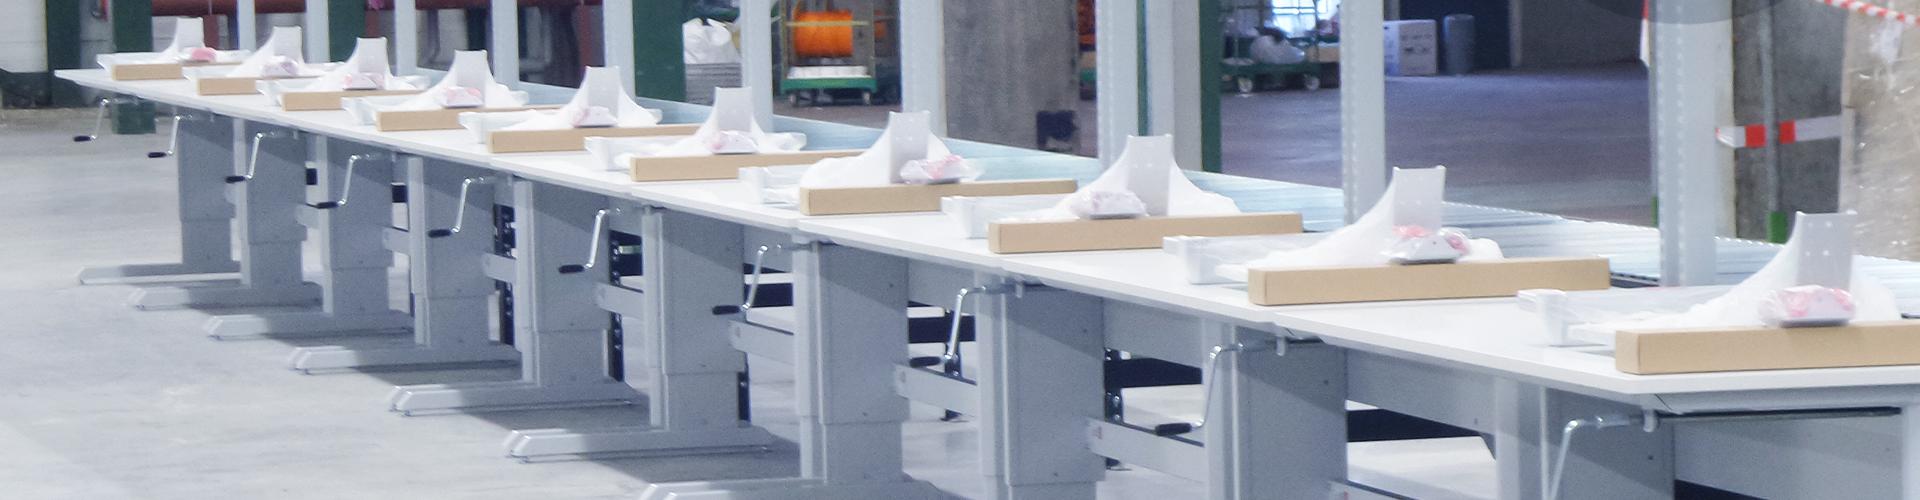 Sovella Nederland levert Treston inpaktafels sinds 1963